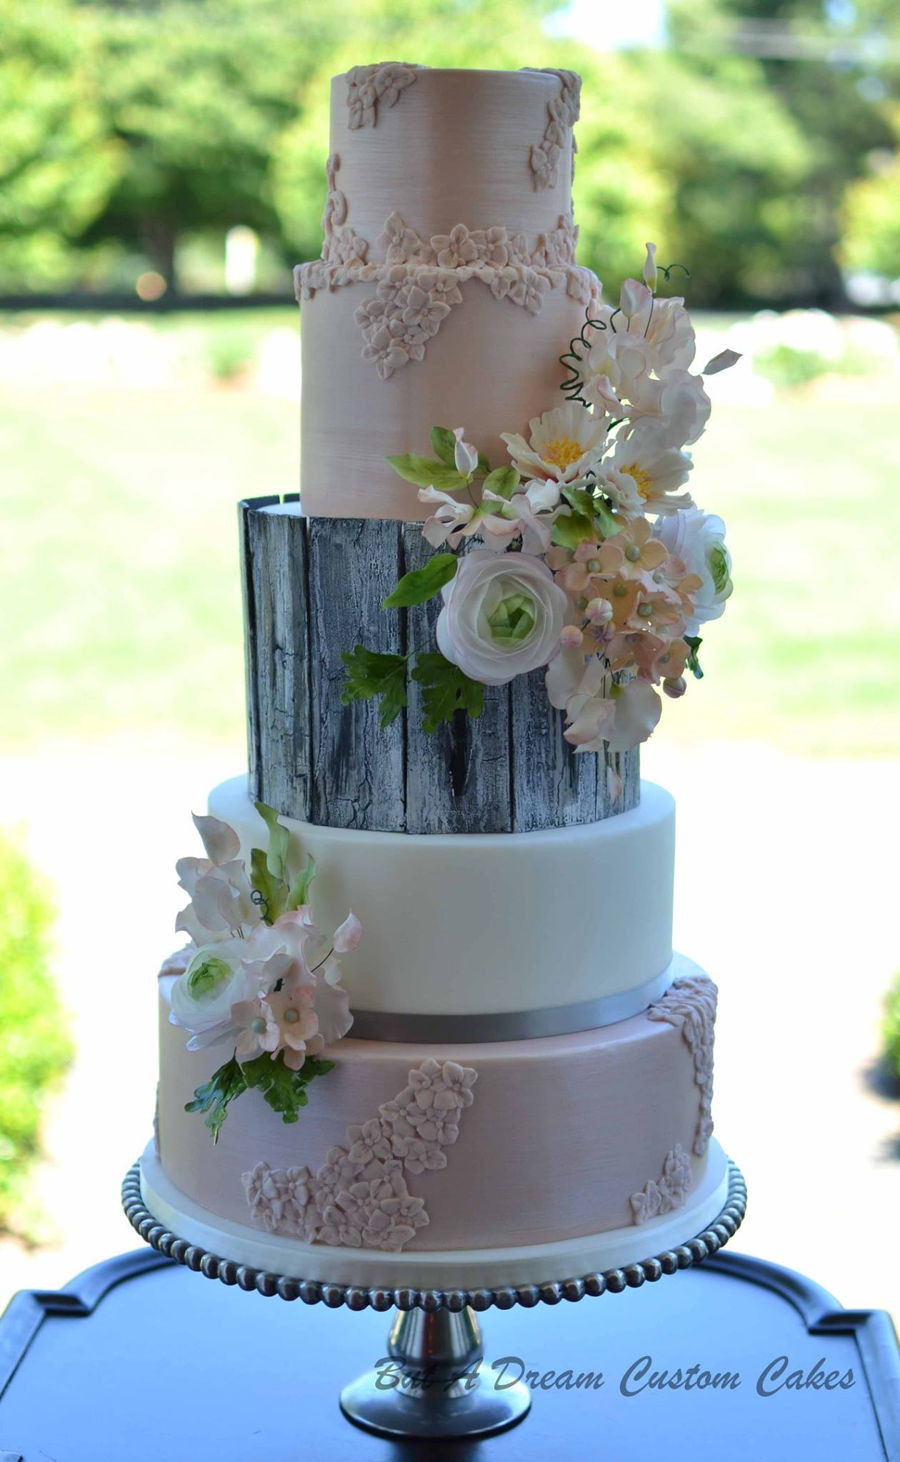 Glam Wedding Cakes  Rustic Glam Wedding Cake CakeCentral